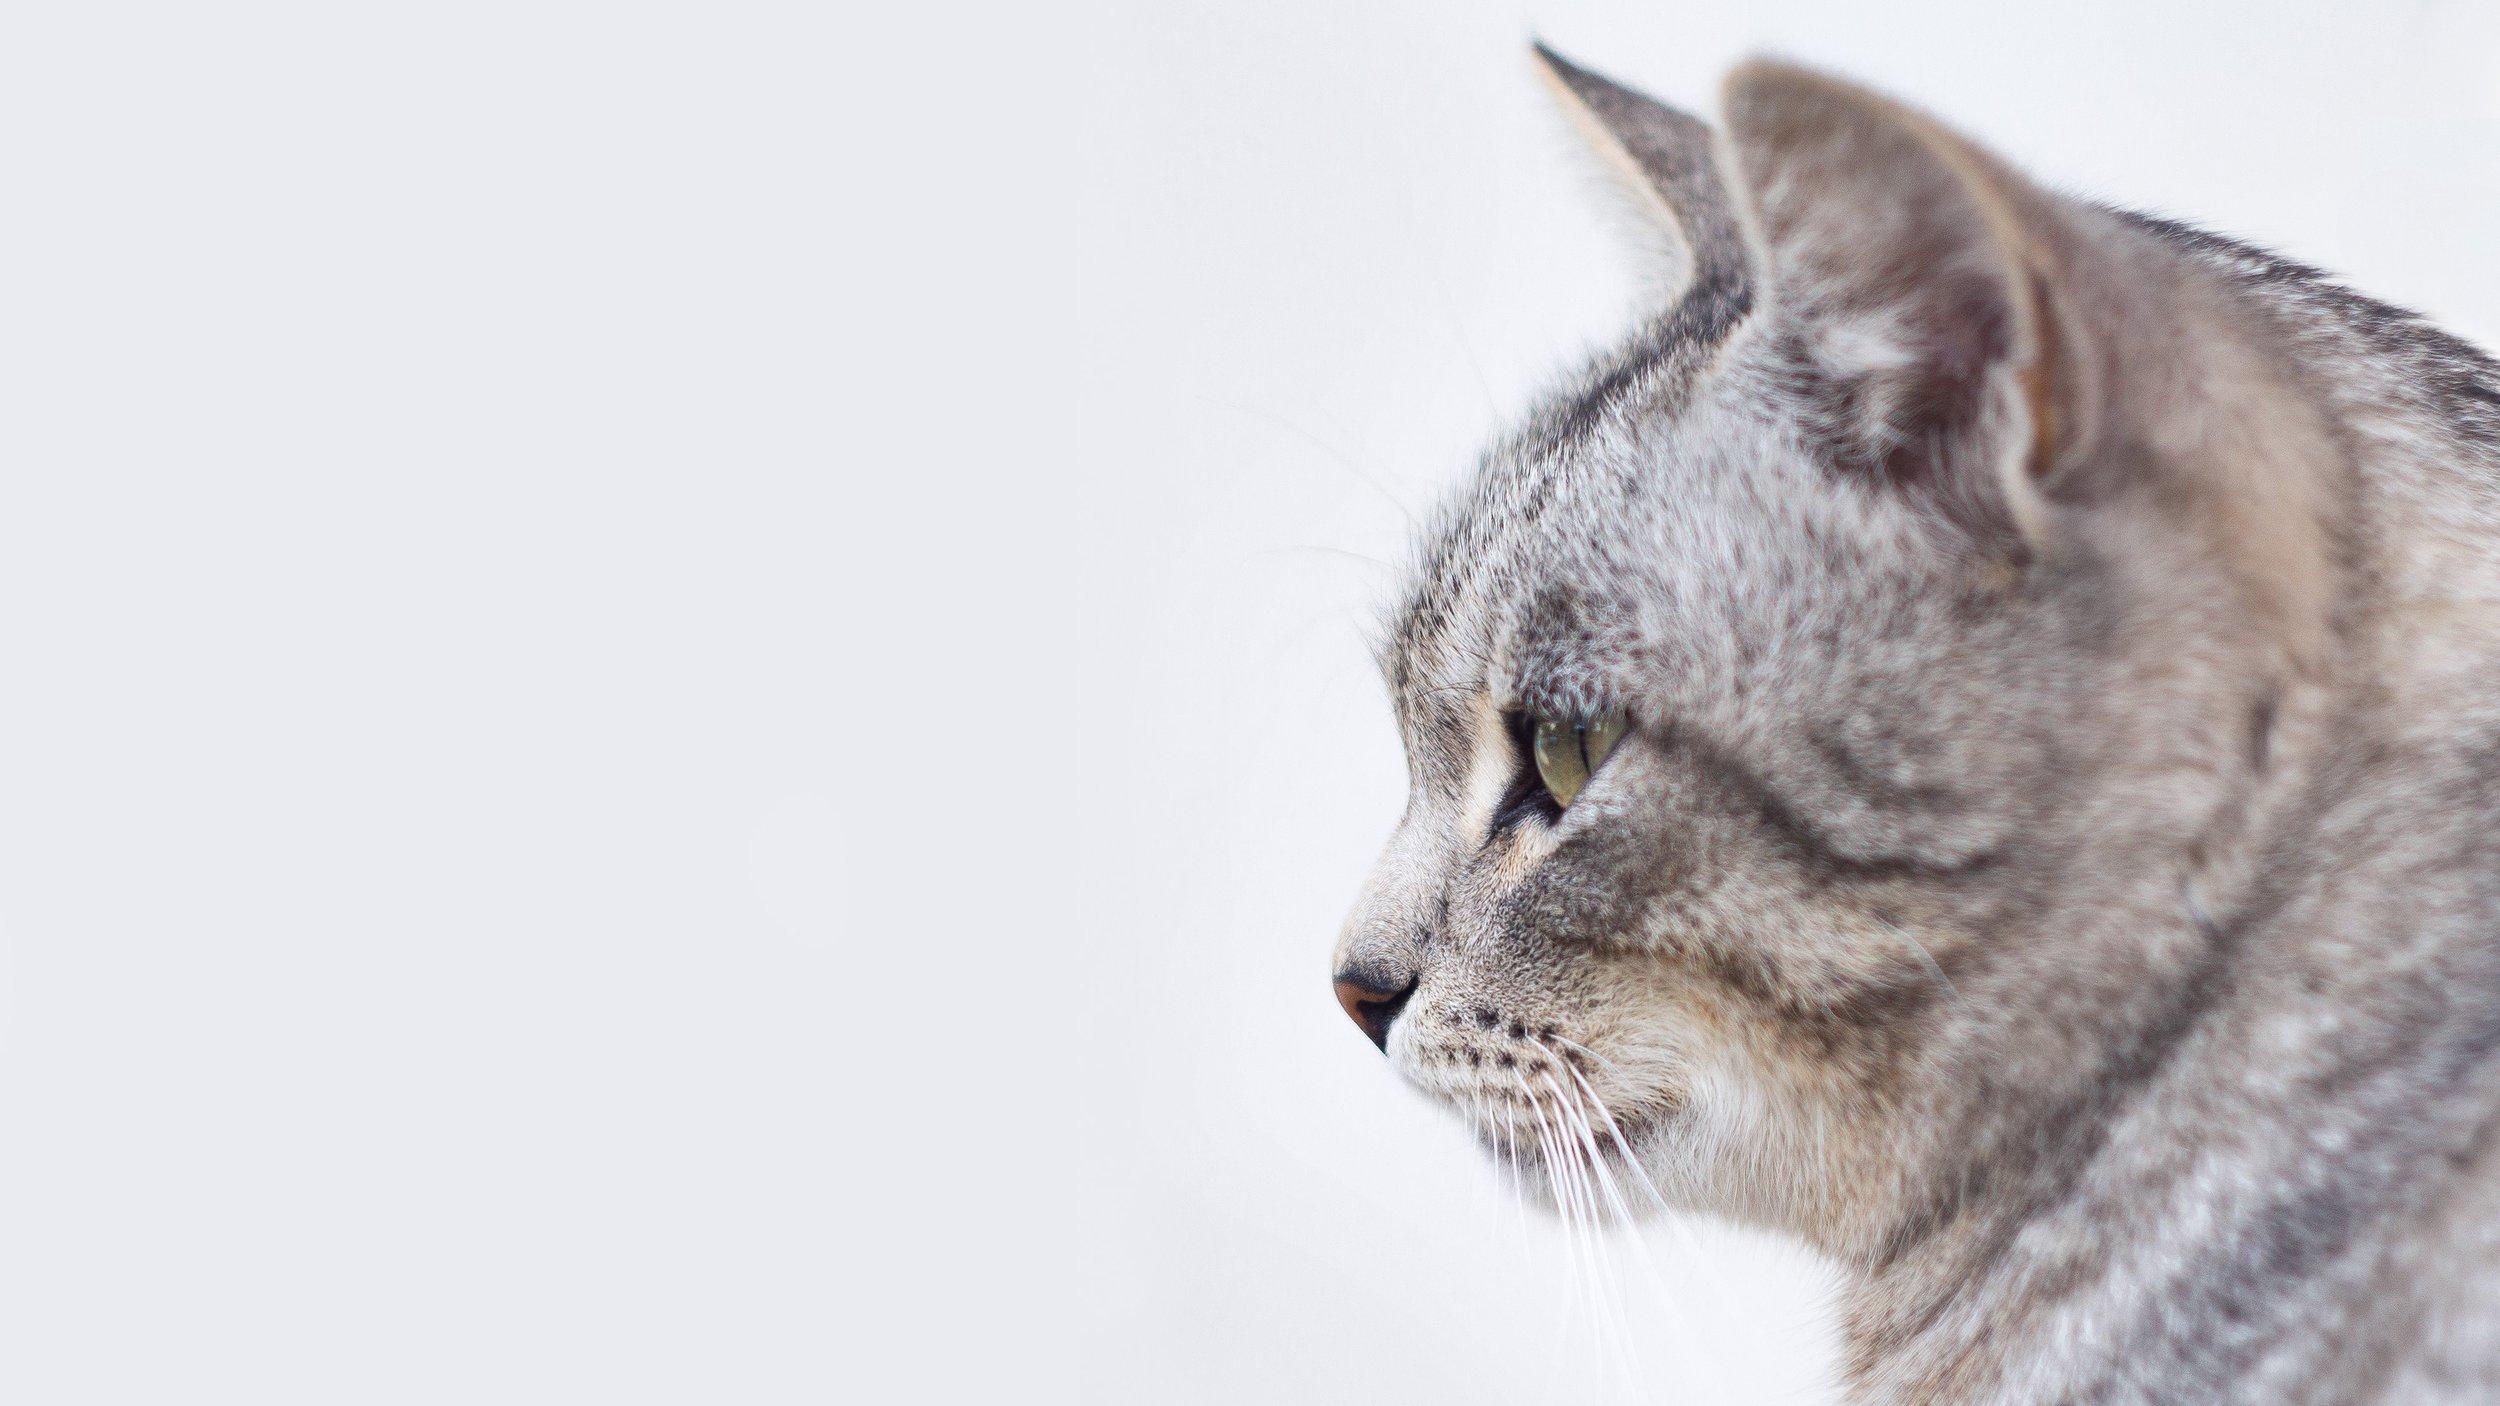 workwithme_cat-portrait_mikhail-vasilyev-34524-unsplash.jpg